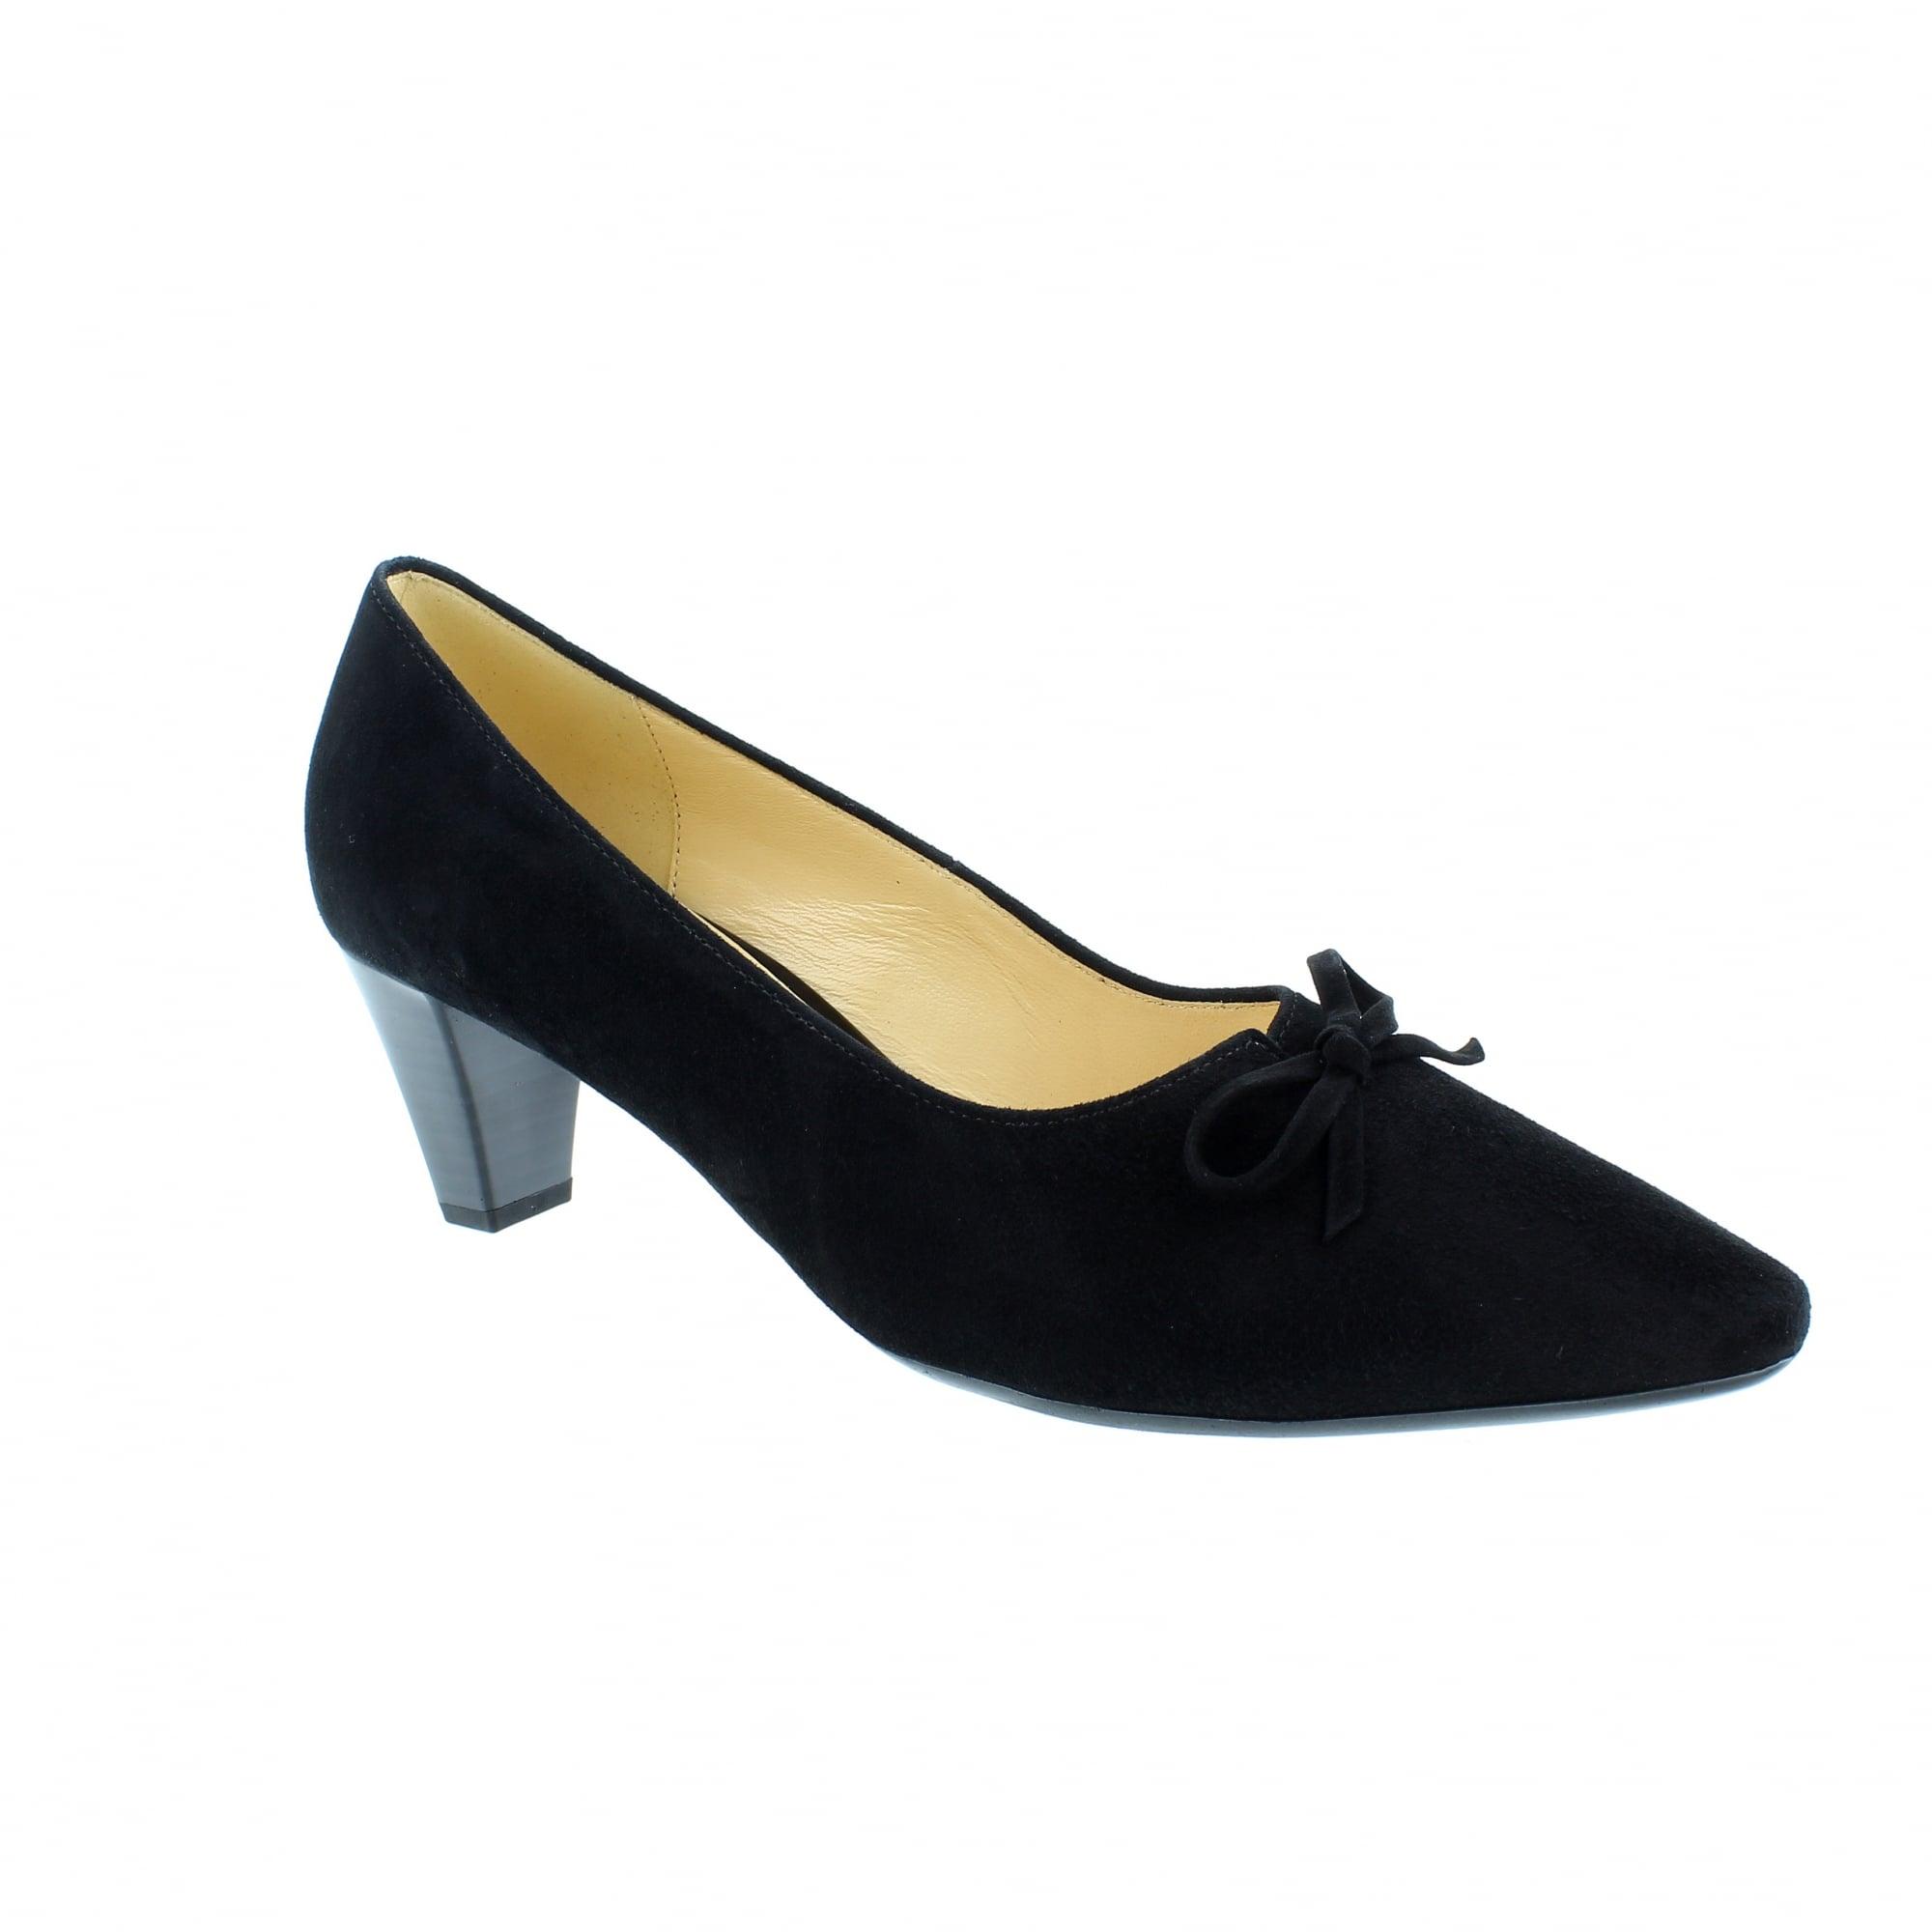 b387a71e0e7 Gabor Pearl 85-147-17 Black Suede Womens Court Shoes | Rogerson Shoes